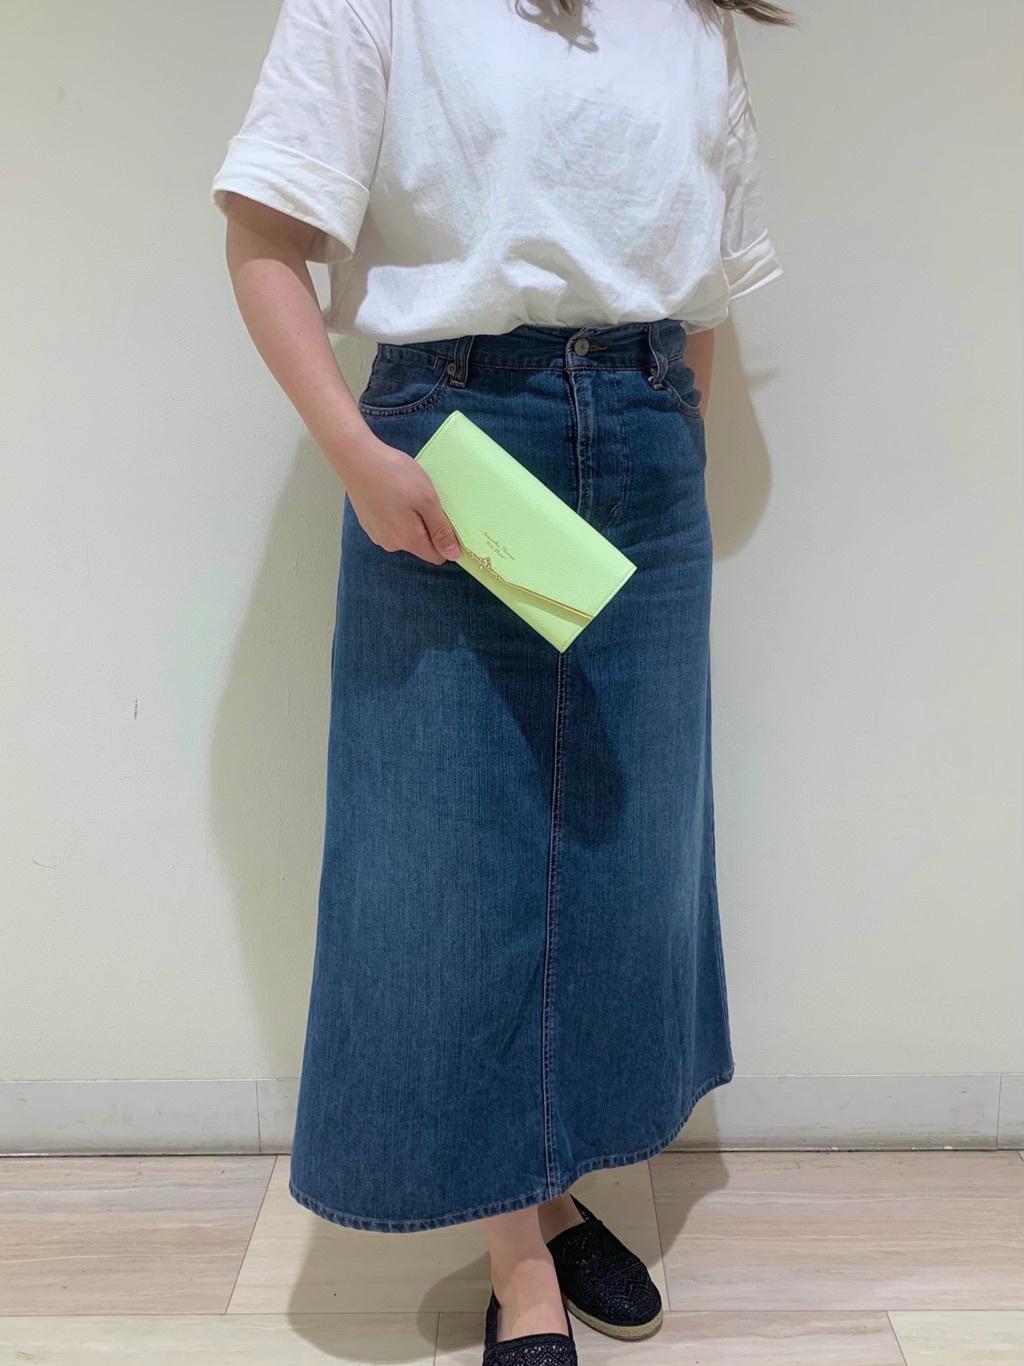 PC丸井静岡店 くりも☺︎